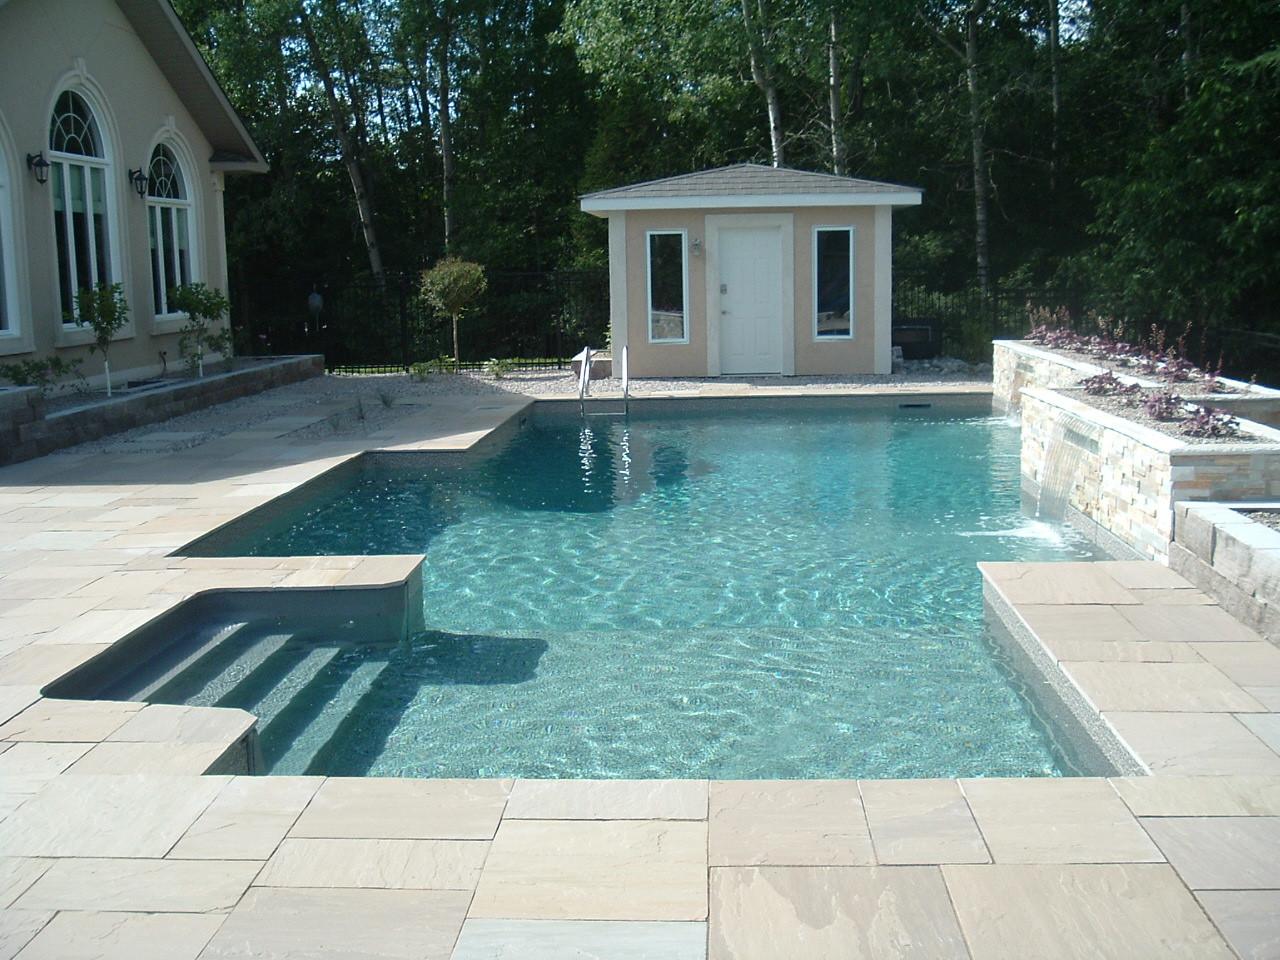 Best ideas about Vinyl Inground Pool . Save or Pin Vinyl Inground Swimming Pools for Ottawa Homes Now.